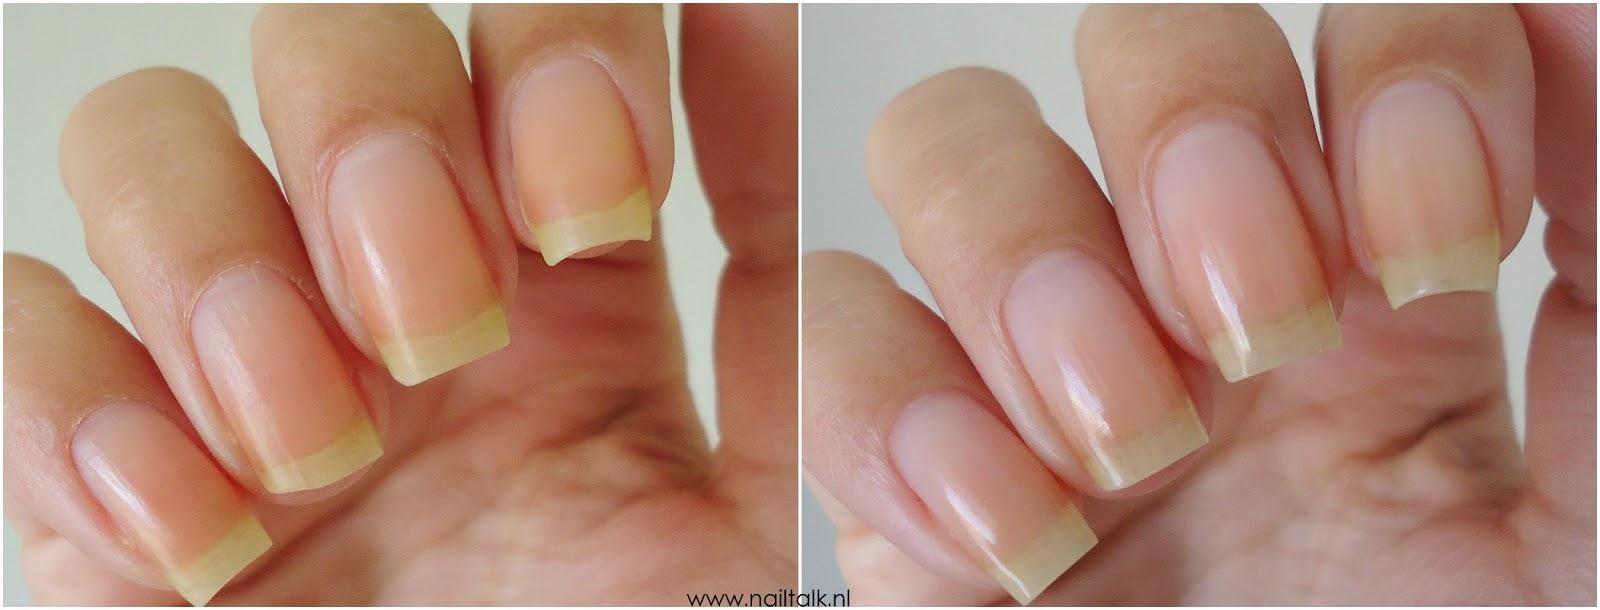 Review Trind Nail Care (Balsam, Buffer & Repair)   NailTalk